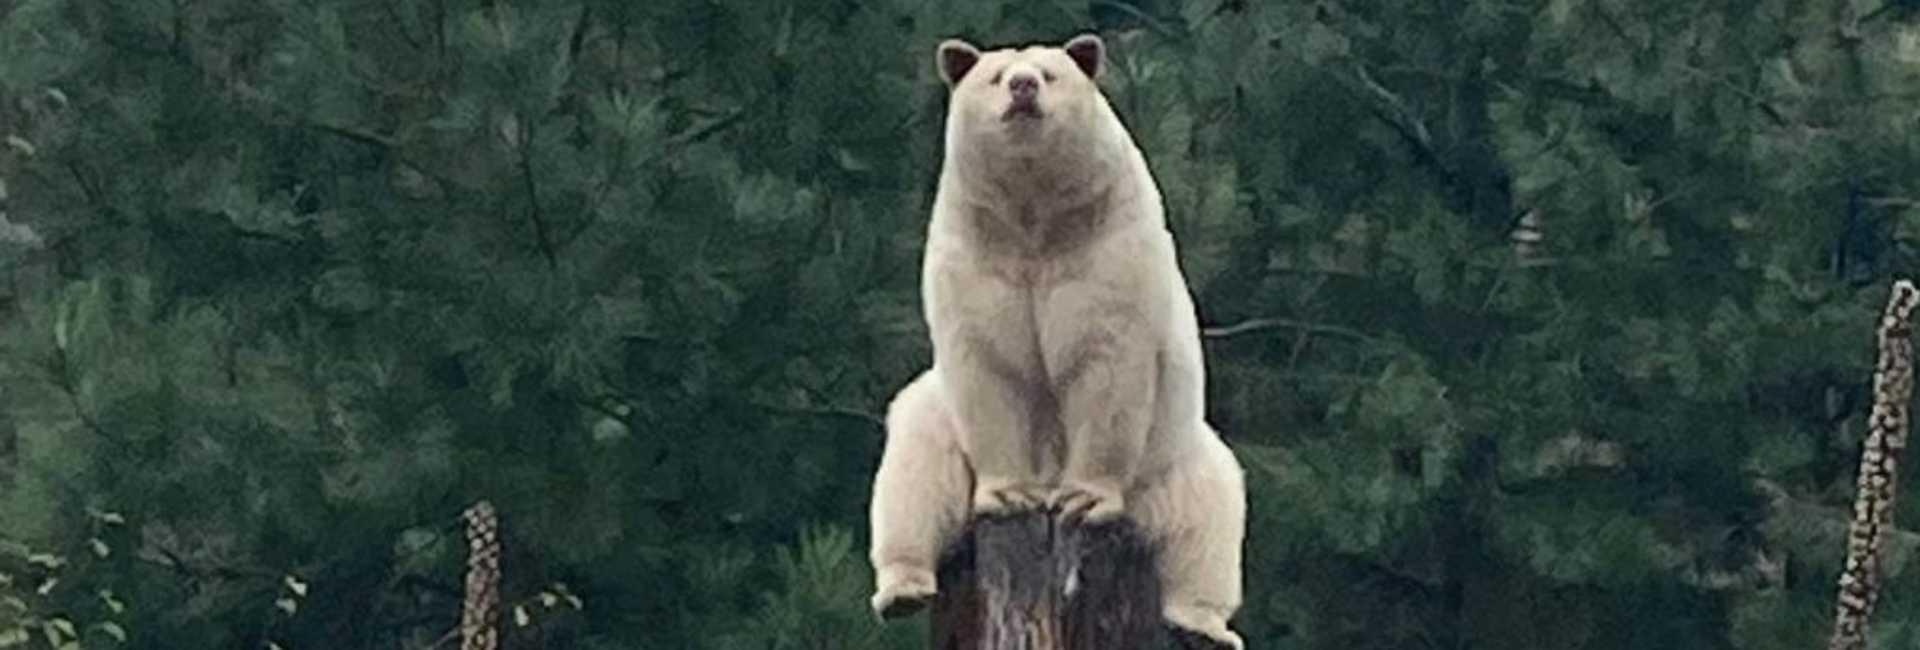 a spirit bear sitting on top of a stump